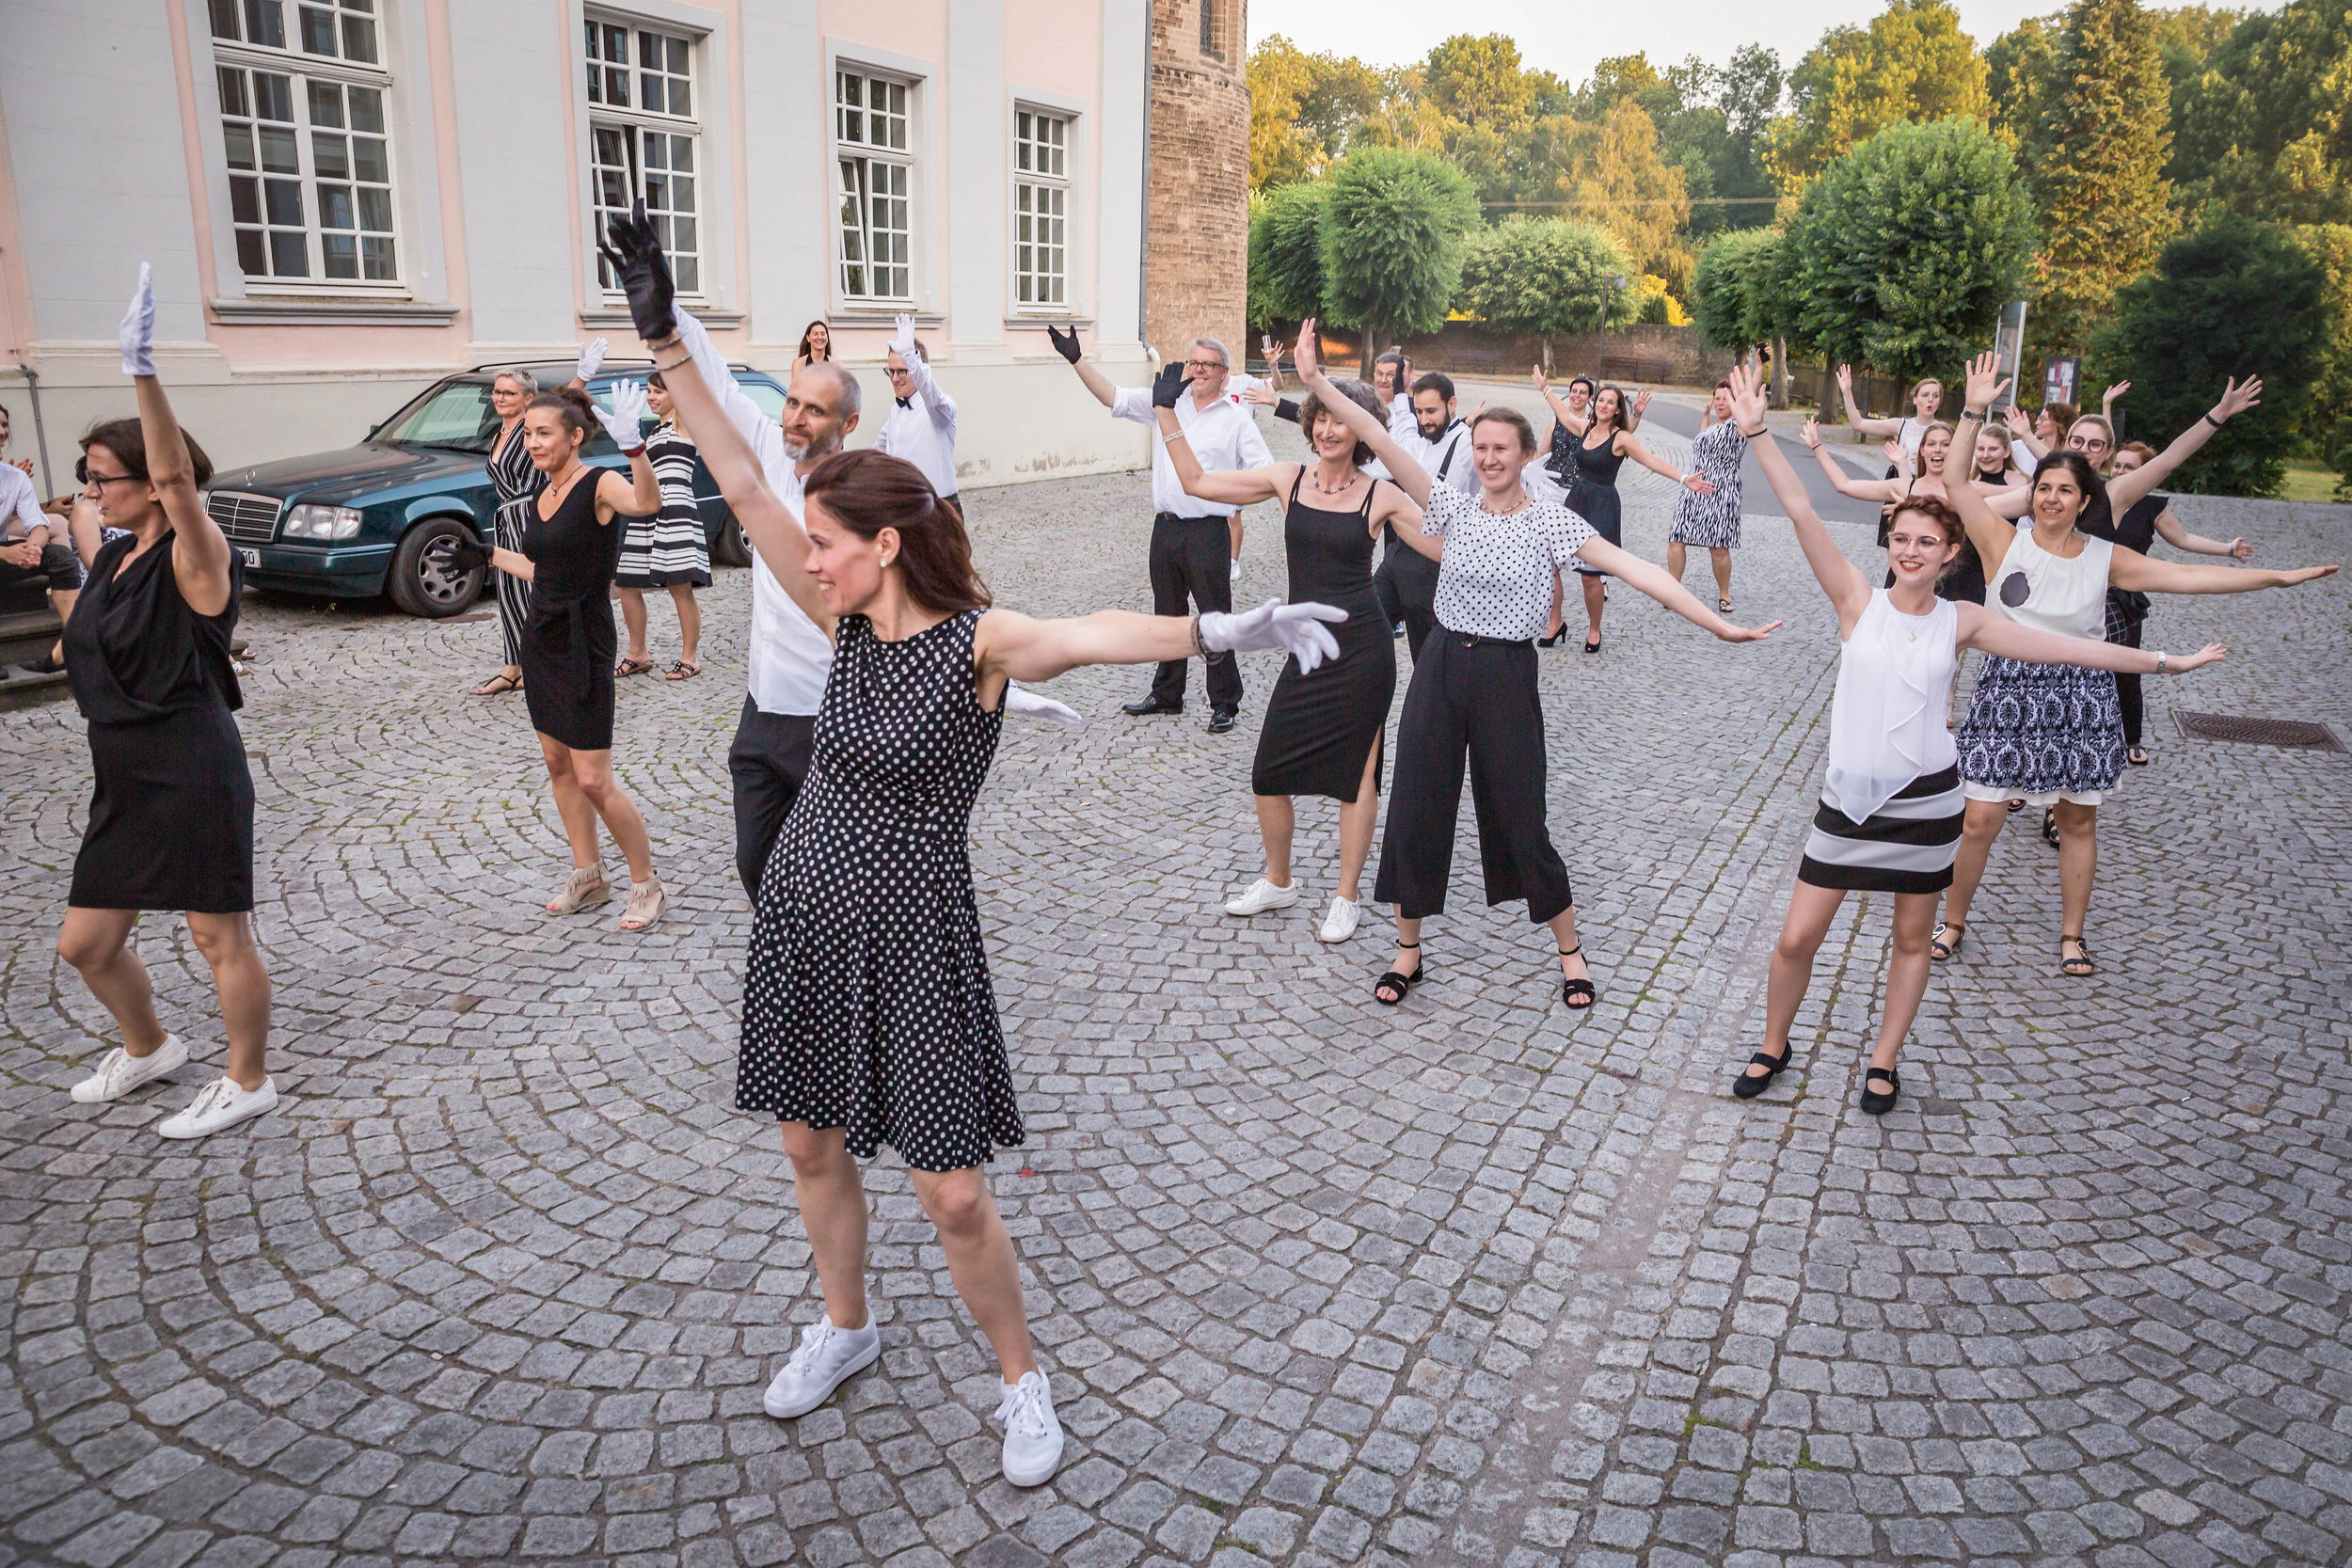 20190626_Akademie_40-jähriges_Jubiläum_FB_kl-5312019.jpg